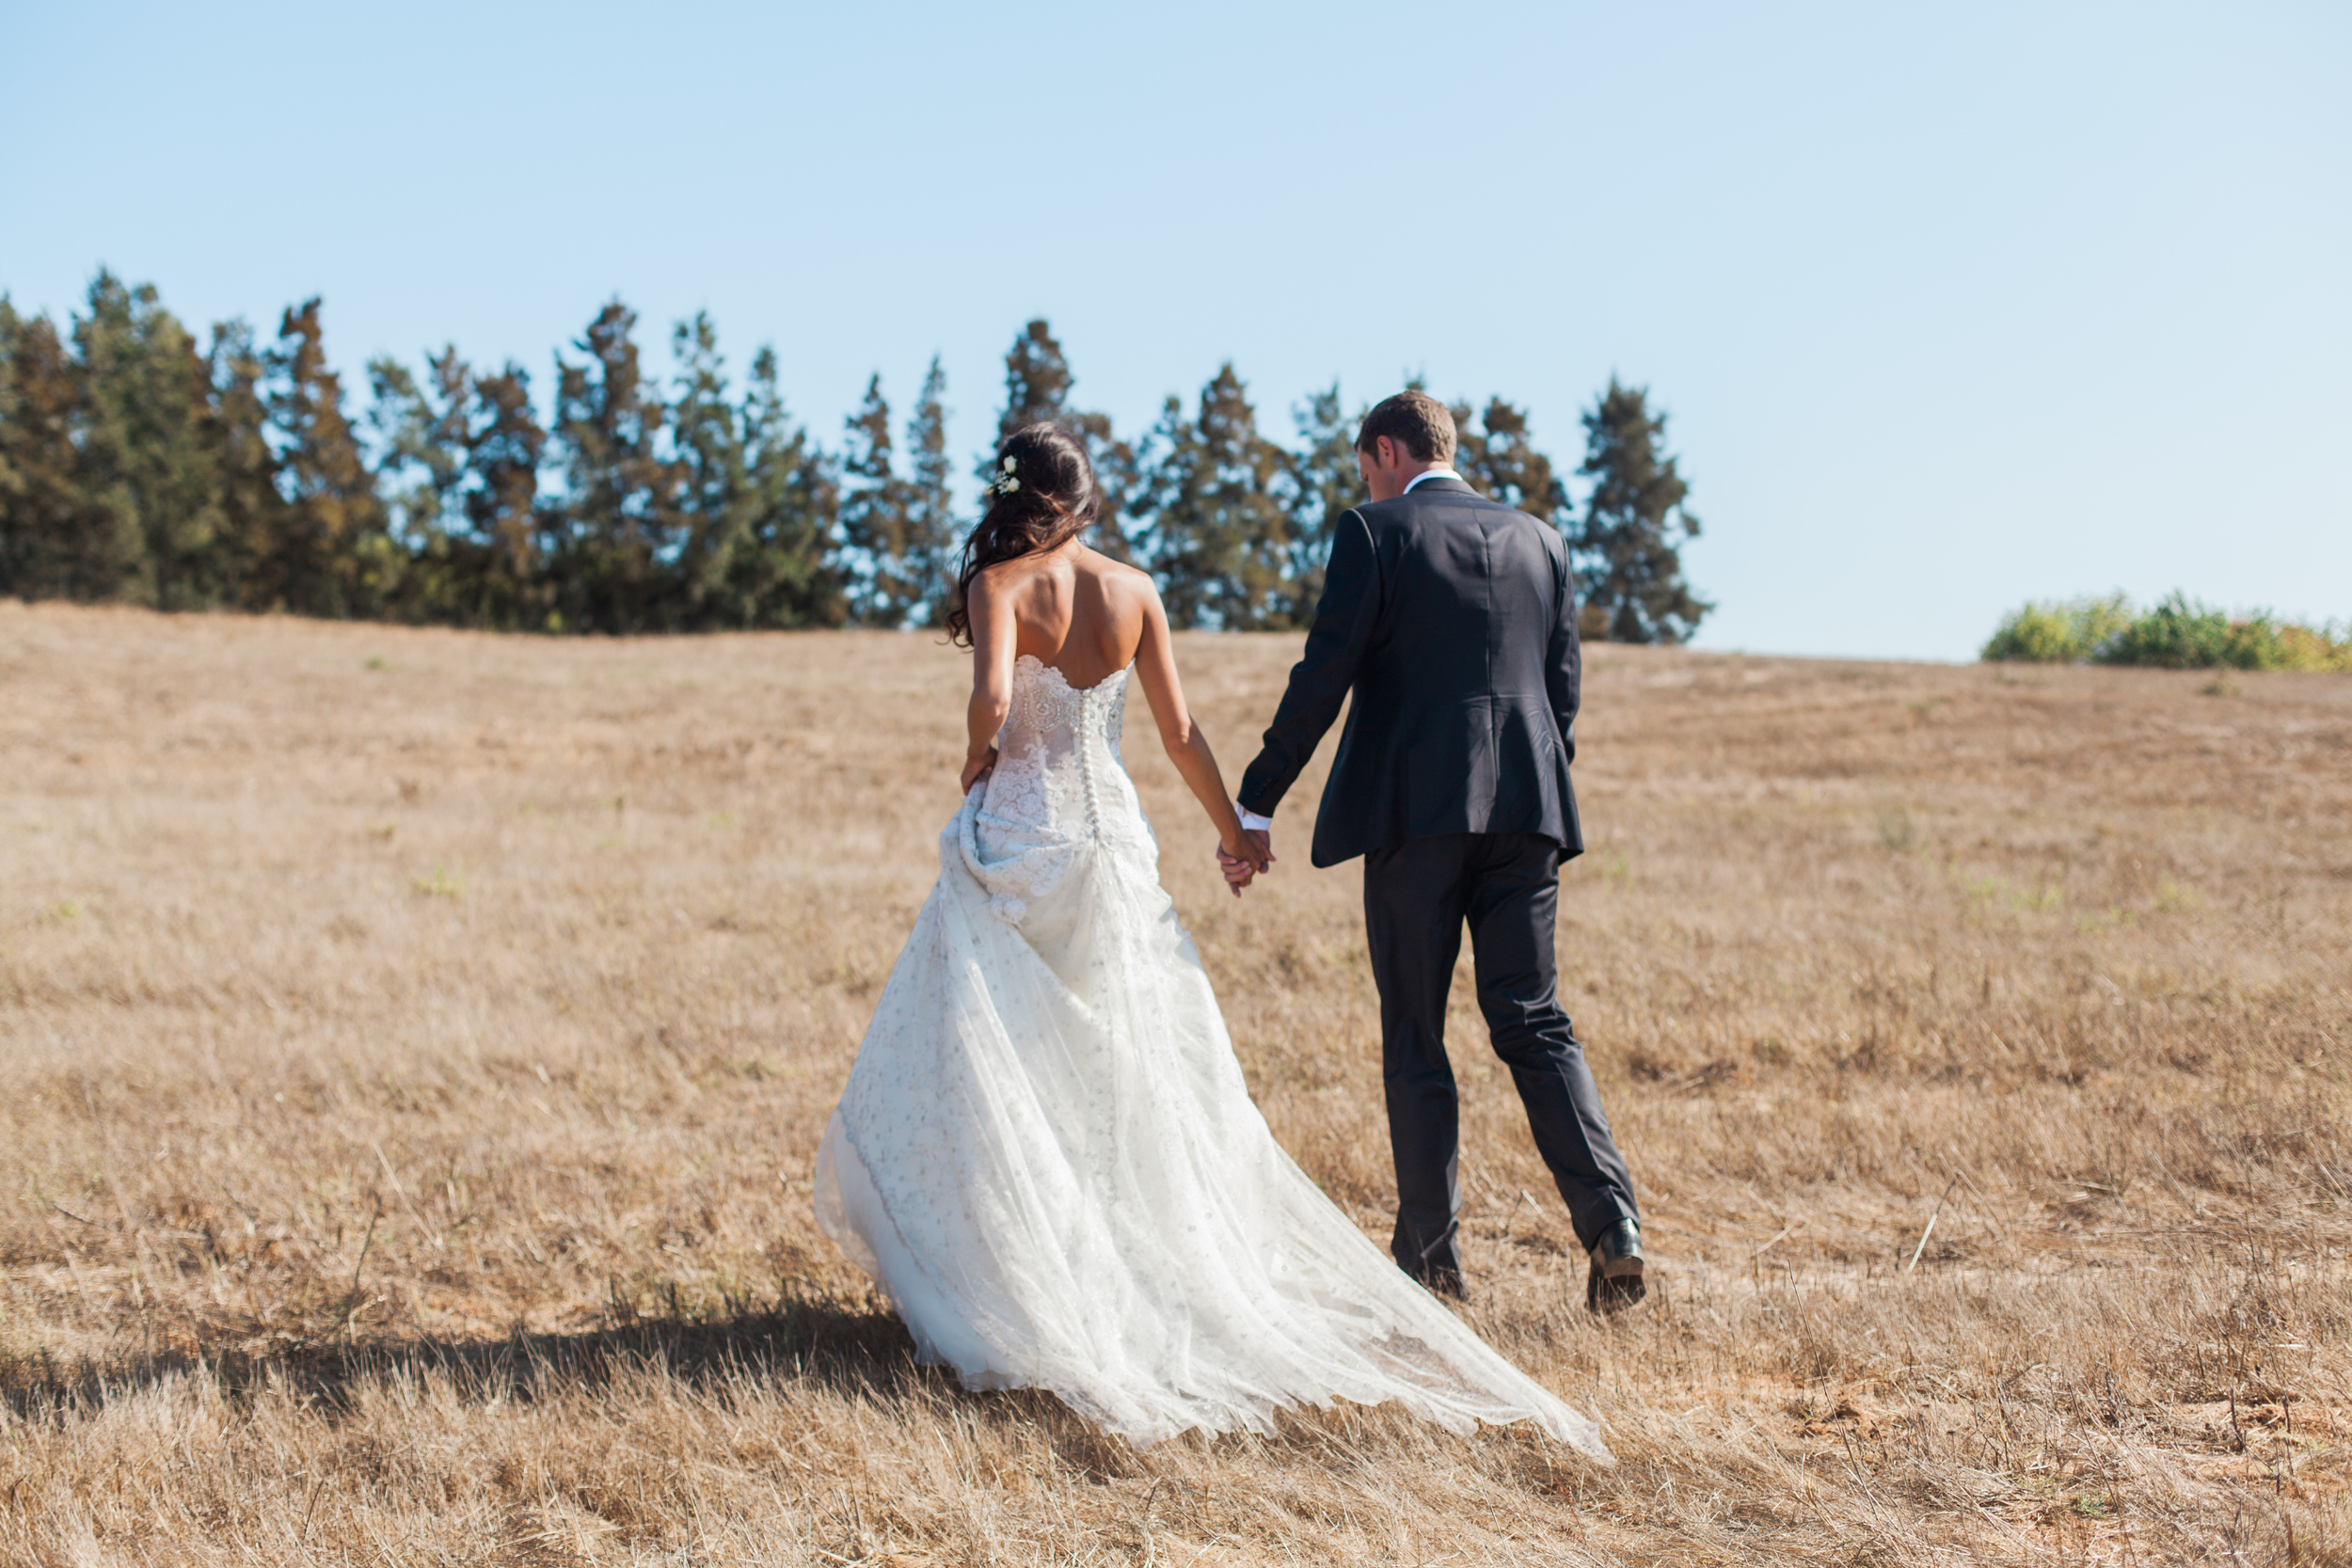 mariarao+wedding+quinta+del+carmen-425.jpg